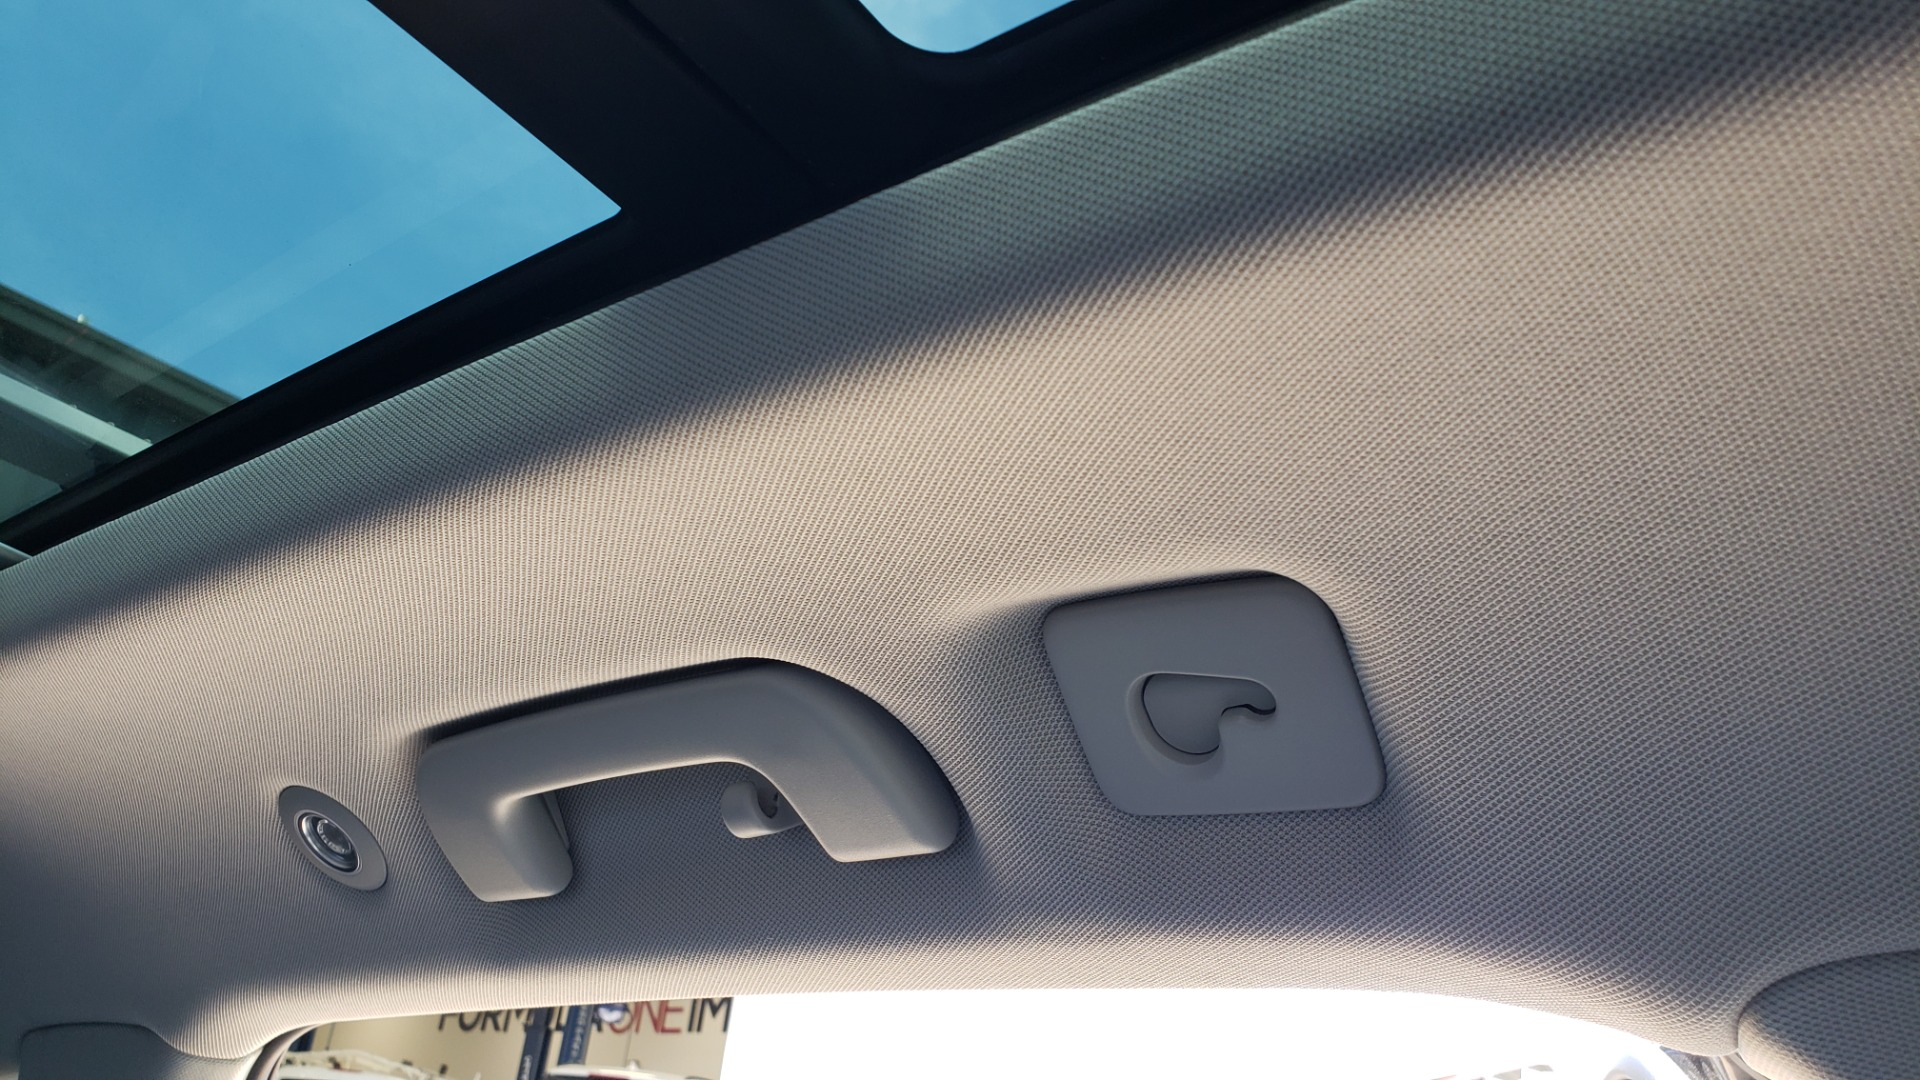 Used 2018 Audi Q7 PRESTIGE TIPTRONIC / NAV / SUNROOF / ADAPTIVE PKG / DRVR ASST / CLD WTHR /  for sale $49,995 at Formula Imports in Charlotte NC 28227 81